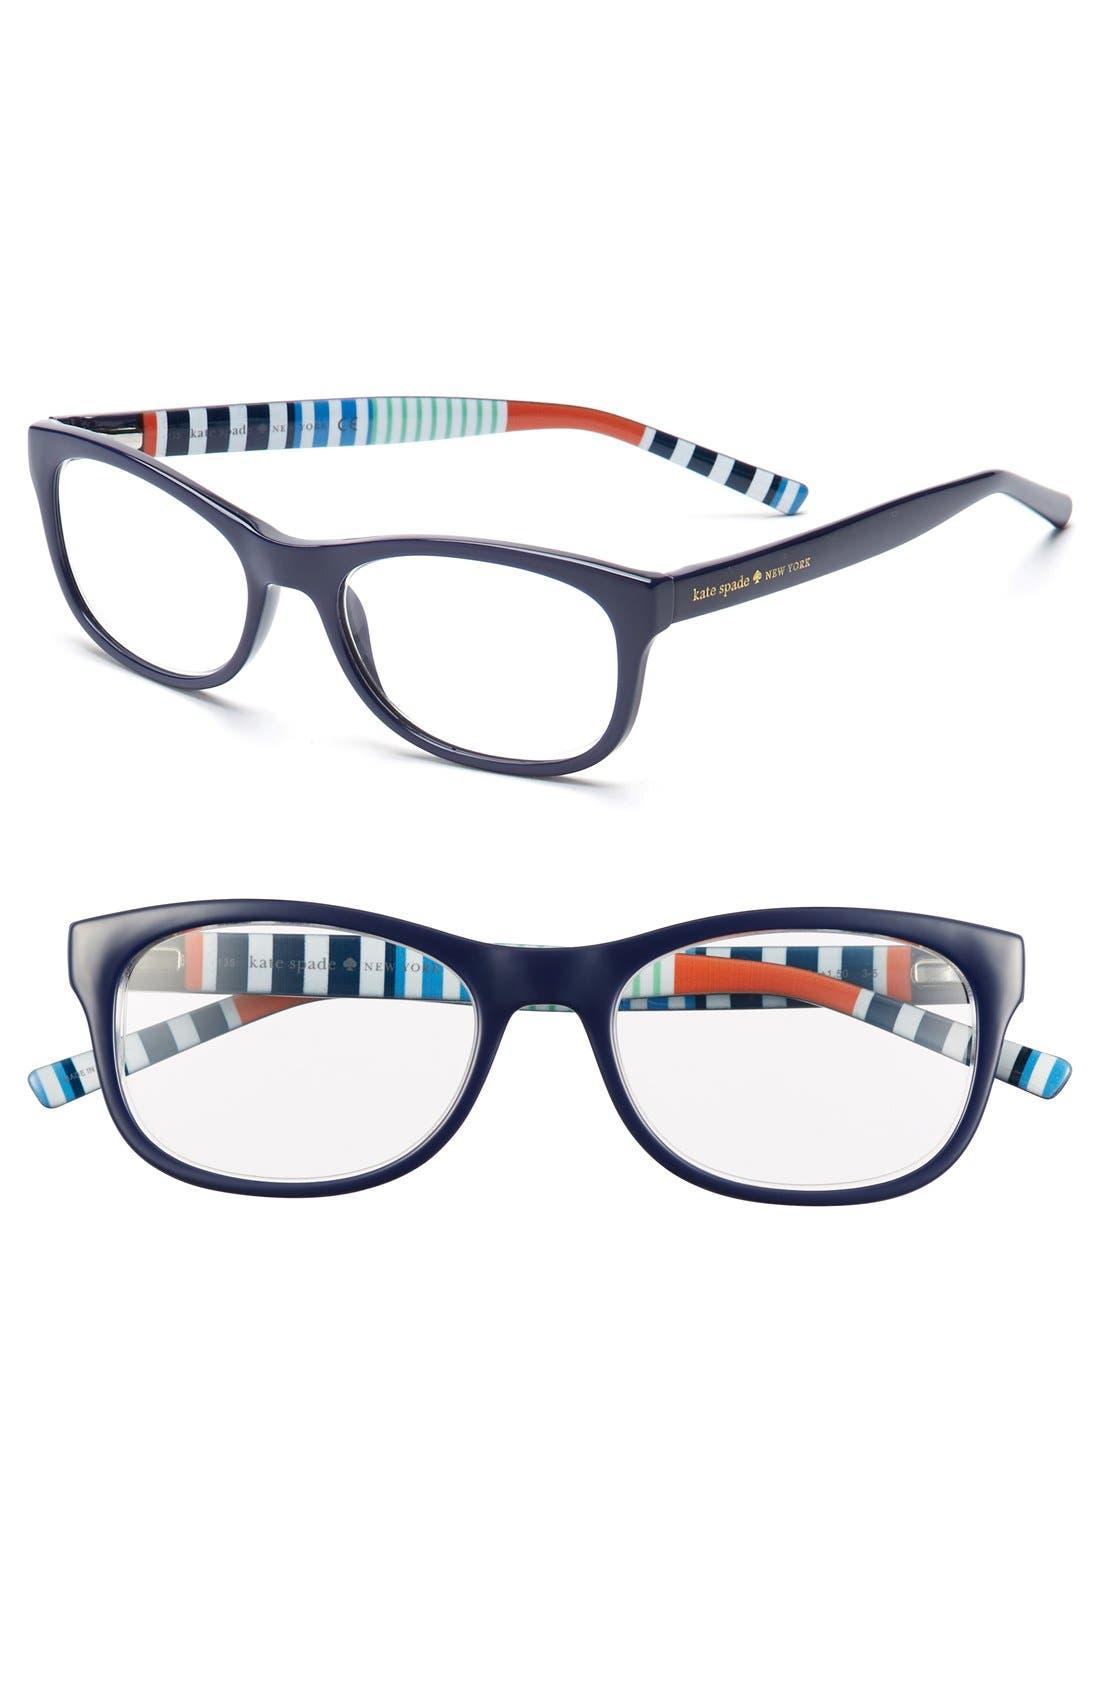 Main Image - kate spade new york letti 51mm reading glasses